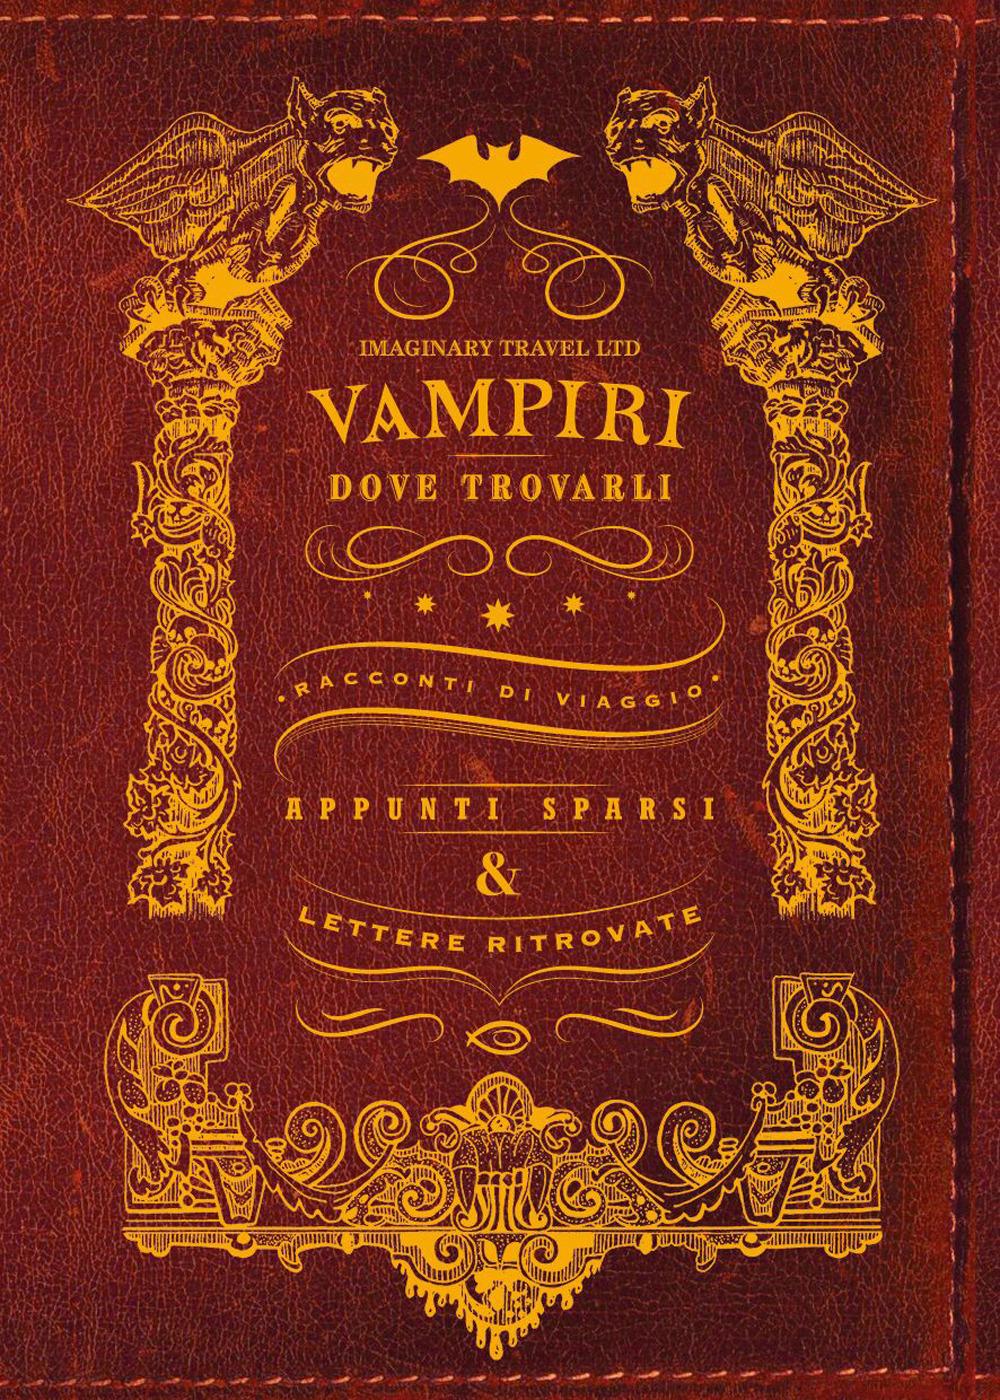 VAMPIRI: DOVE TROVARLI. EDIZ. ILLUSTRATA - Mingrone Michele; Scardillo Caterina; Vettori Sara - 9788836270293